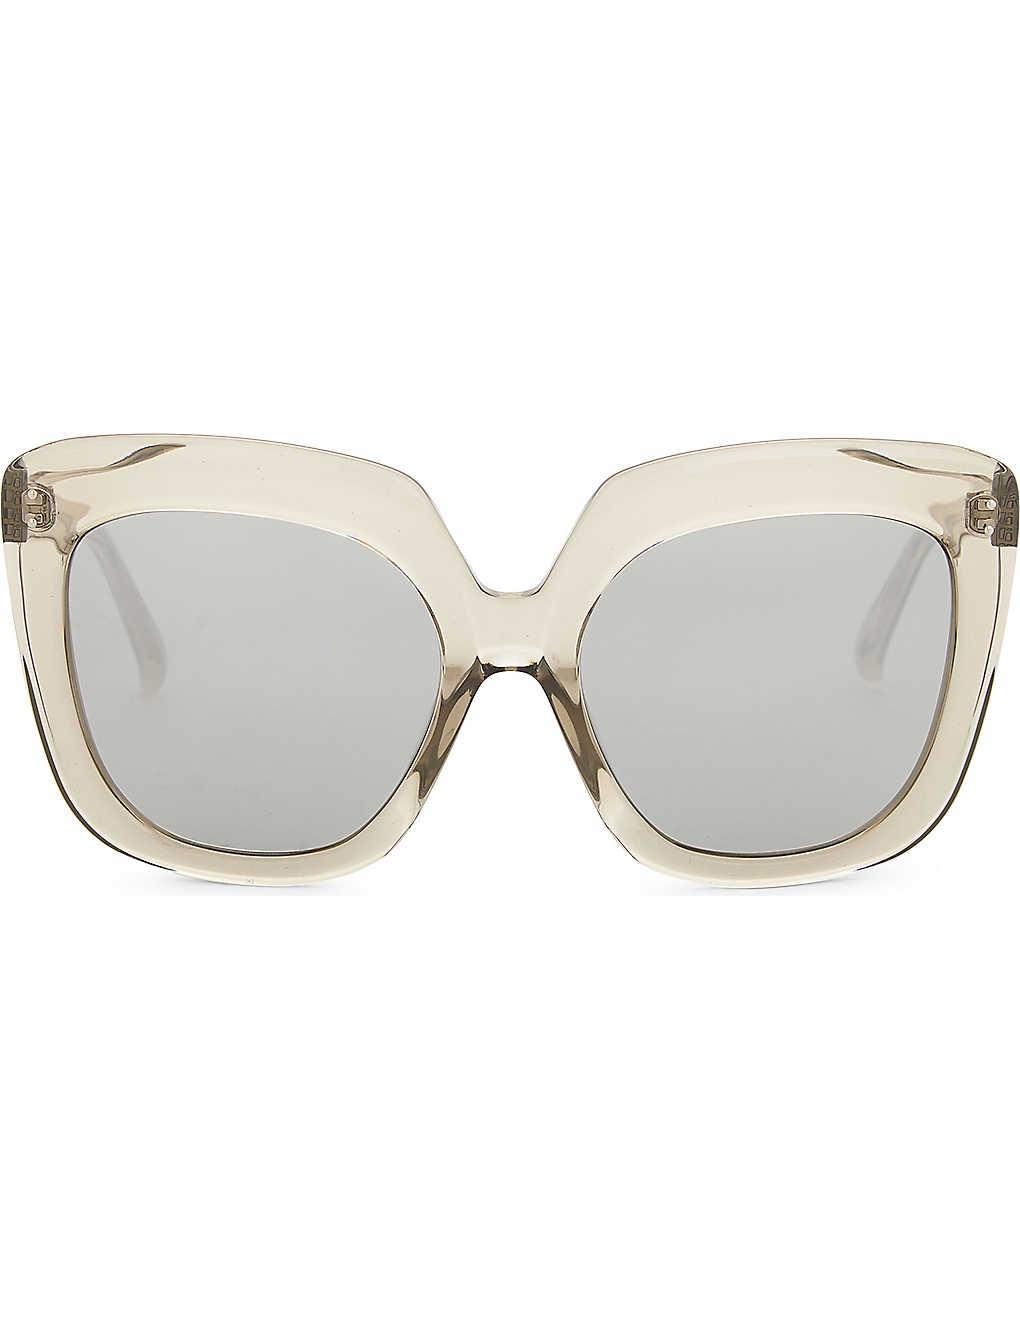 04b70fef980 LINDA FARROW - Oversized square-frame sunglasses